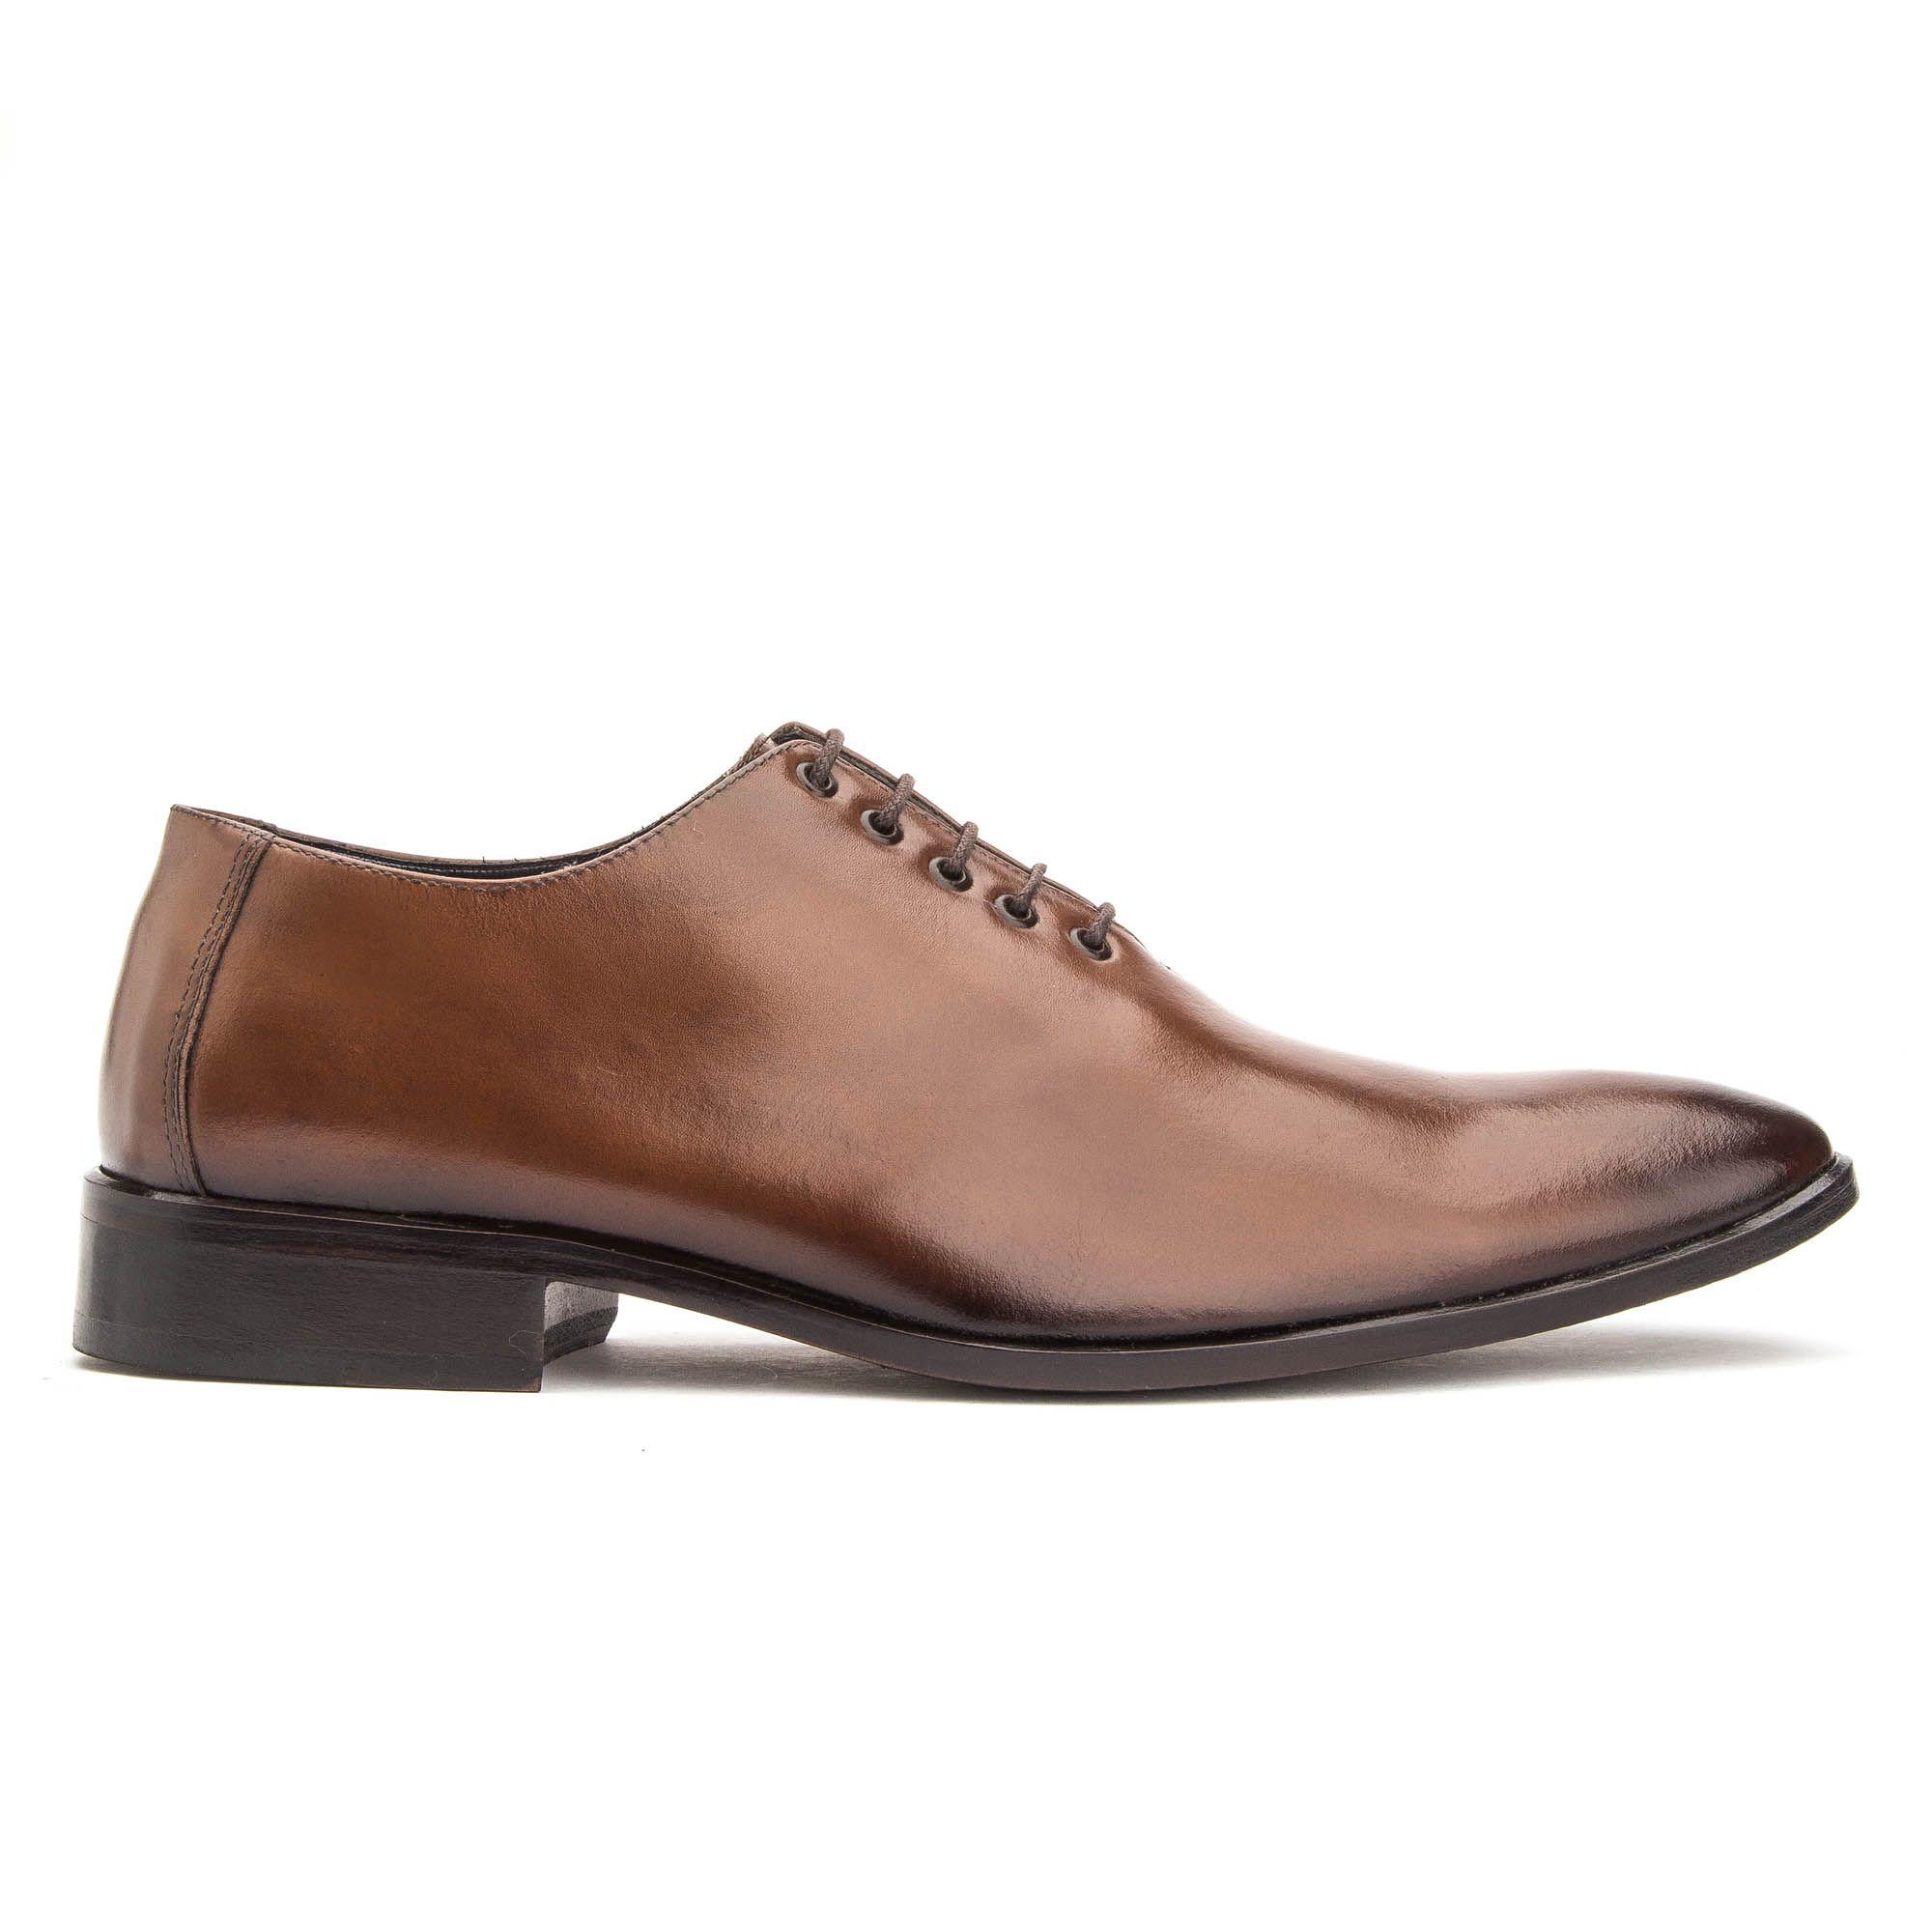 Sapato social na cor whisky masculino em couro legítimo de amarrar